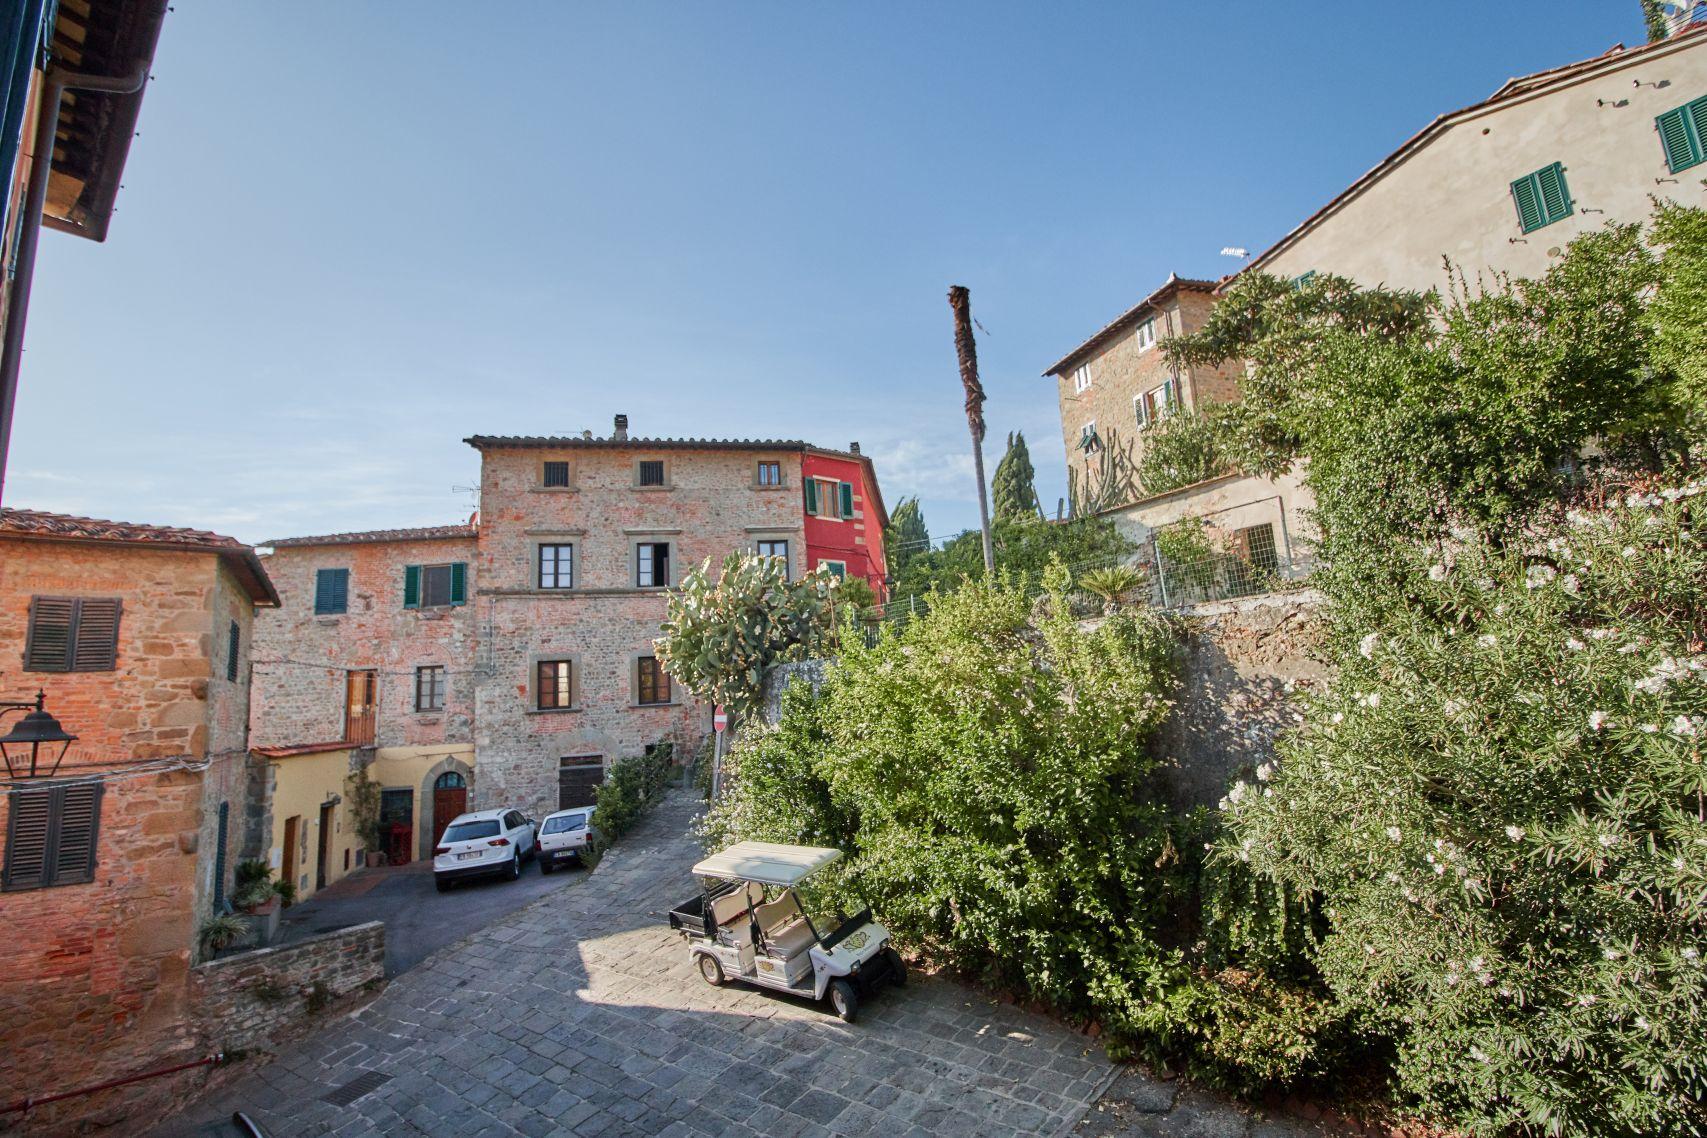 Villa Sermolli als Stopp vom Toskana Roadtrip